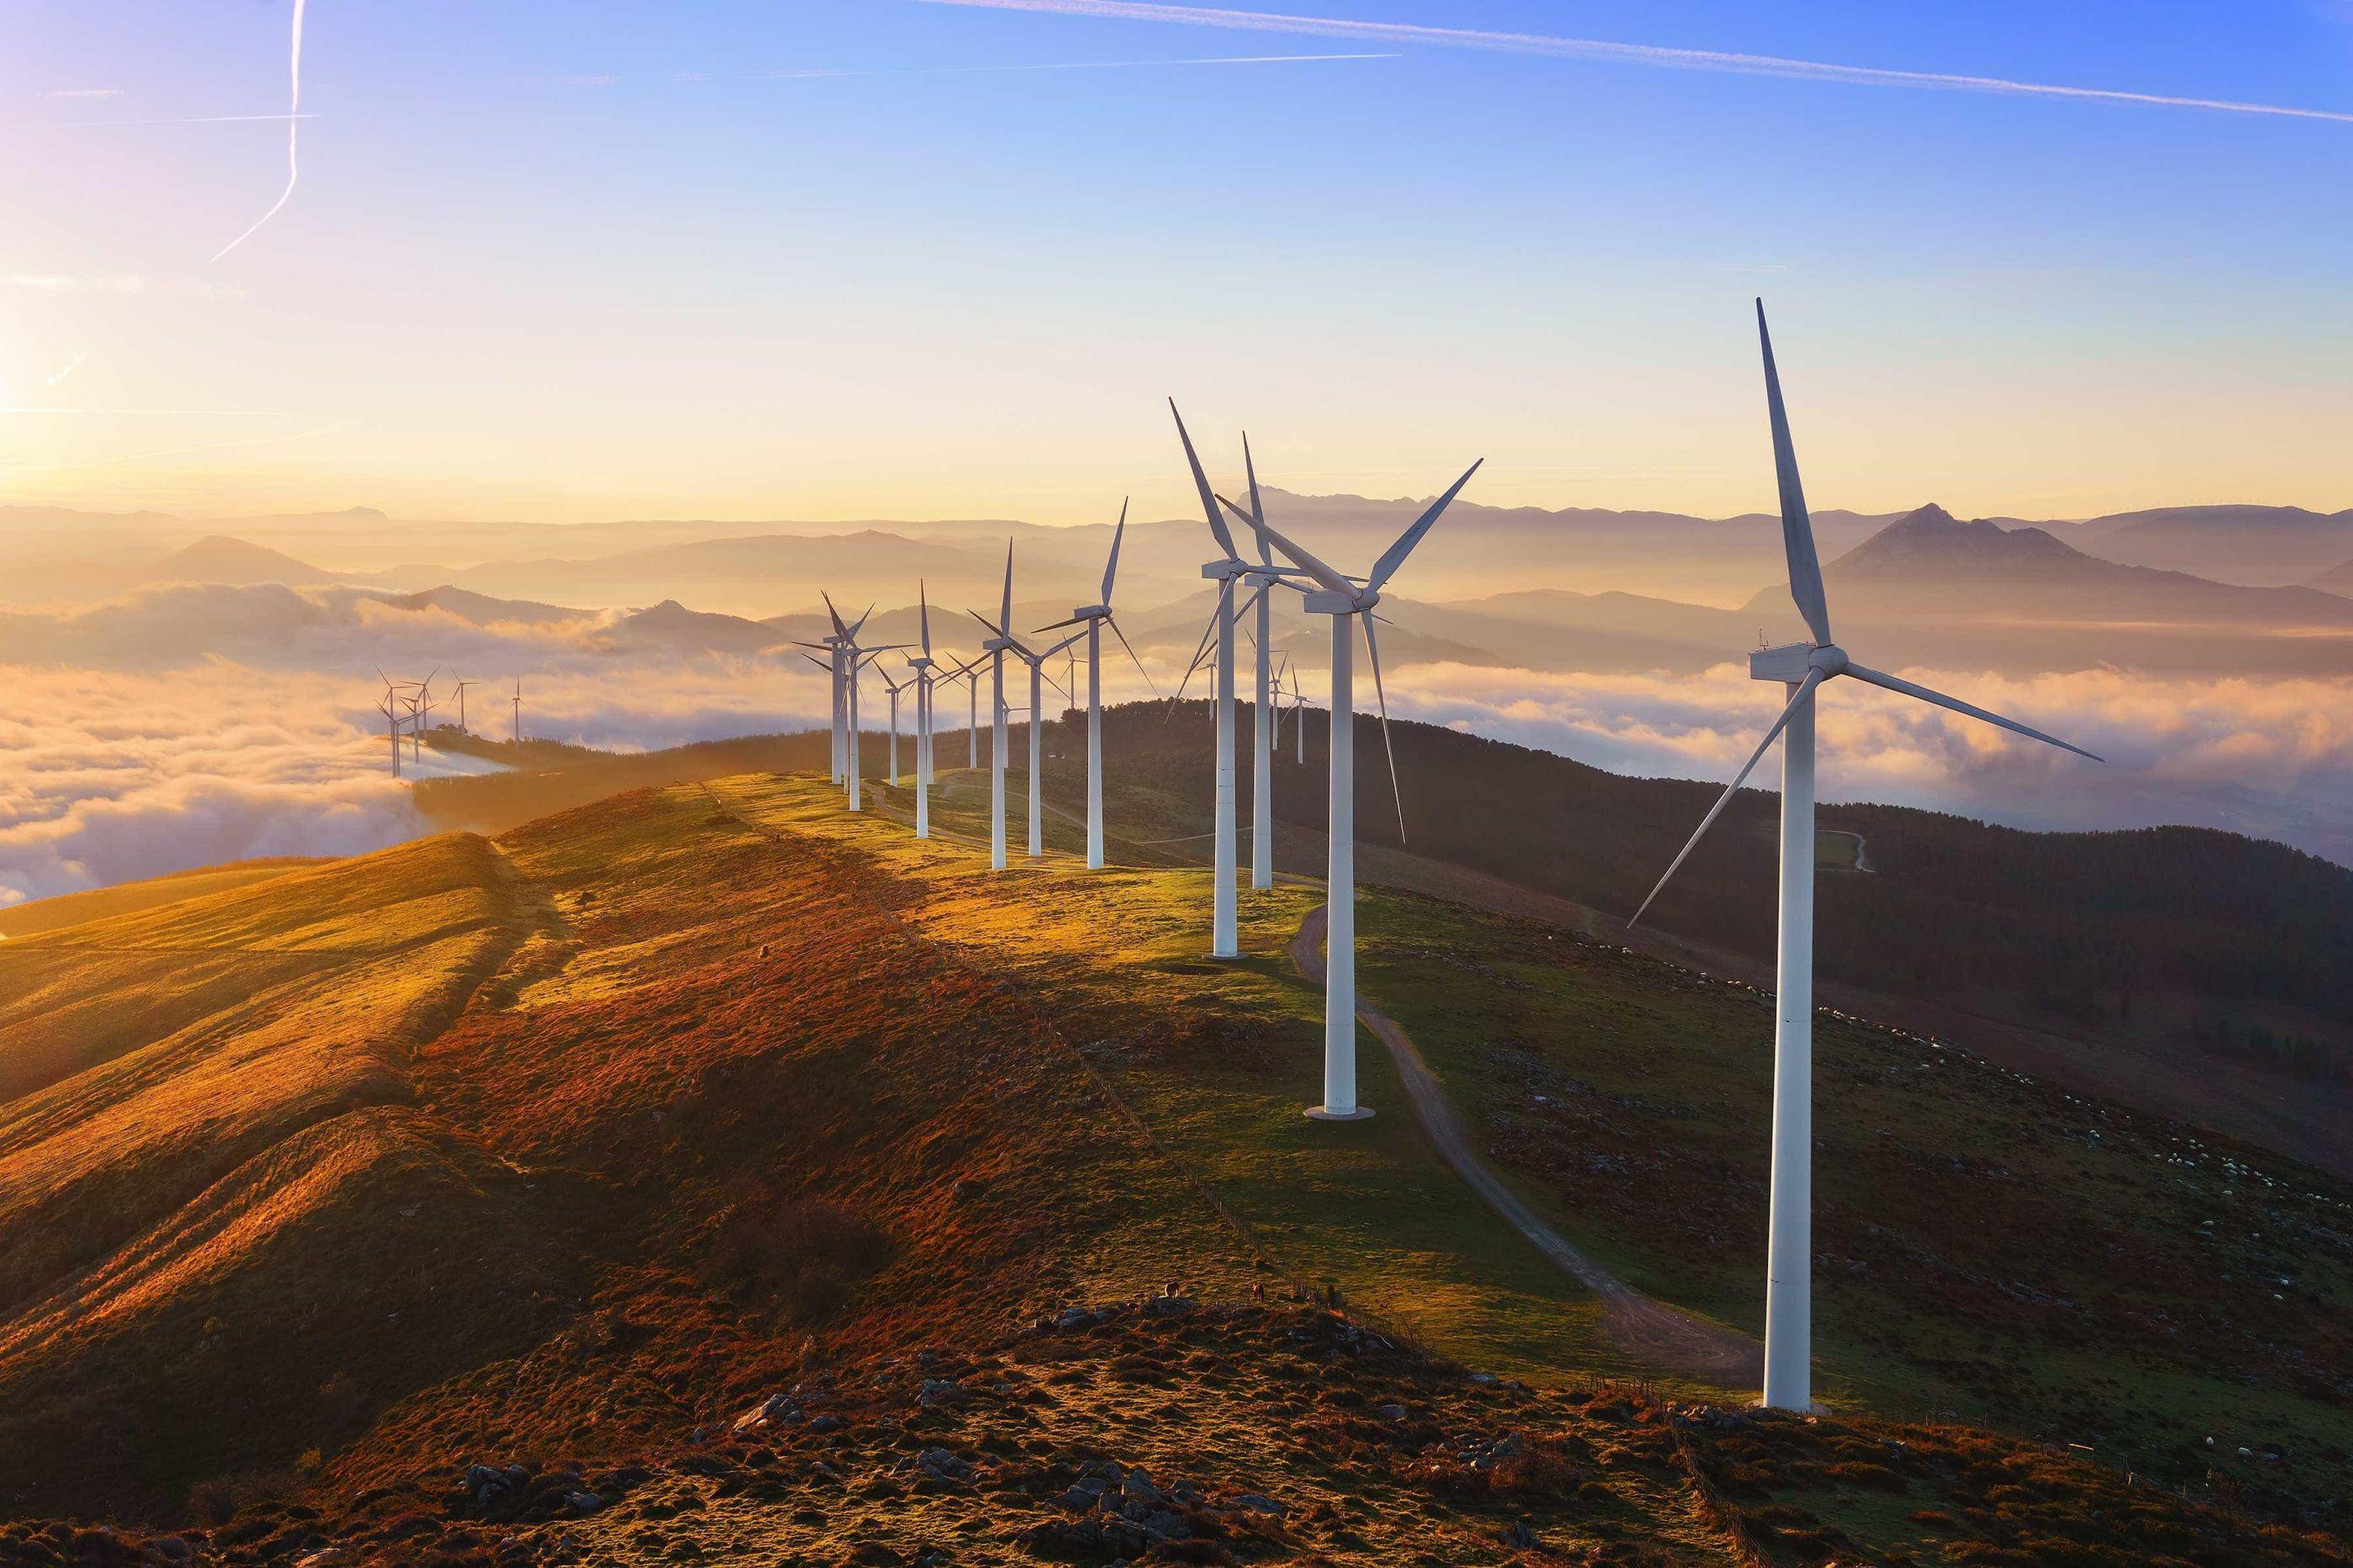 'Joint venture' da EDPR e da Shell assegura projeto eólico nos EUA